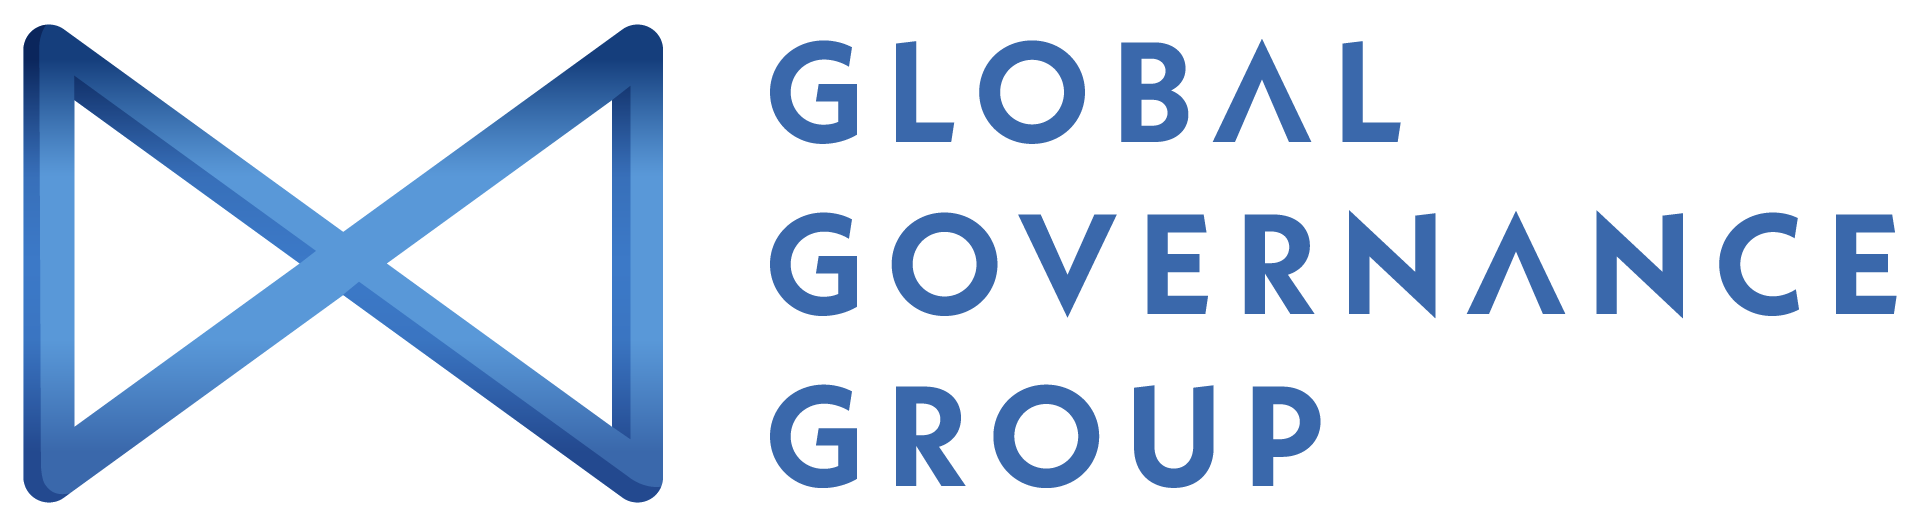 Global Governance Group learning